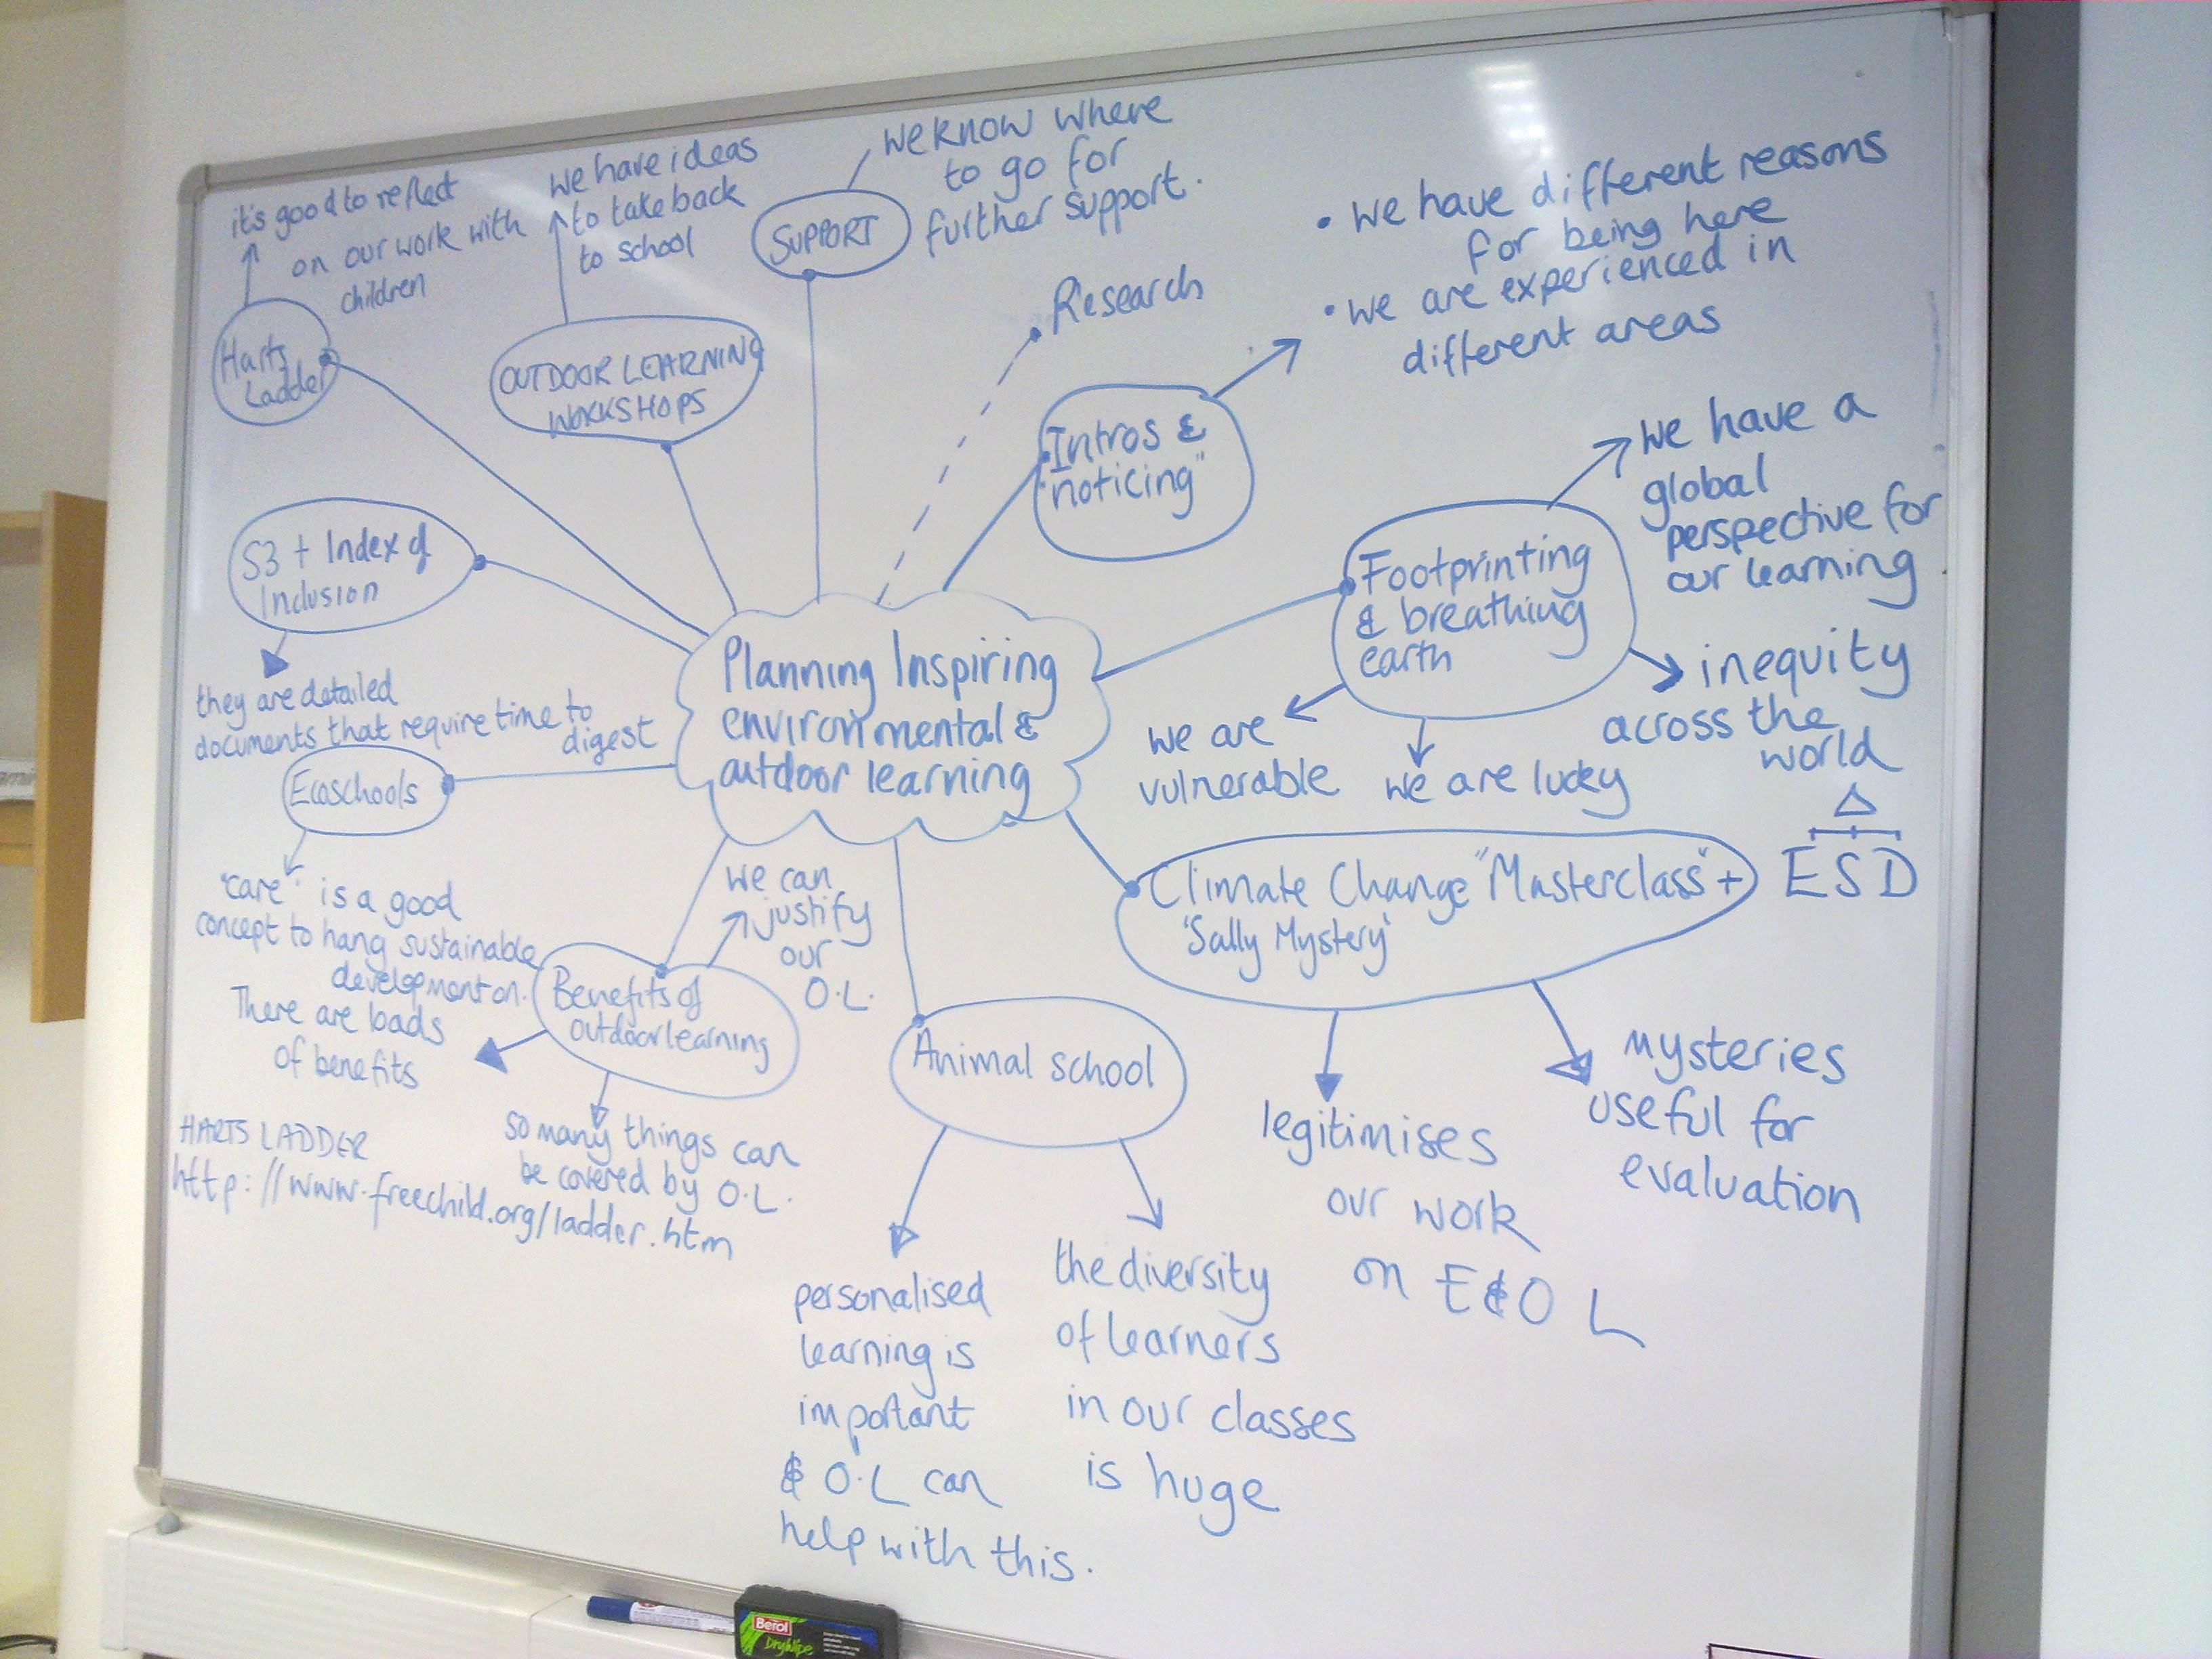 evaluating eco-schools training